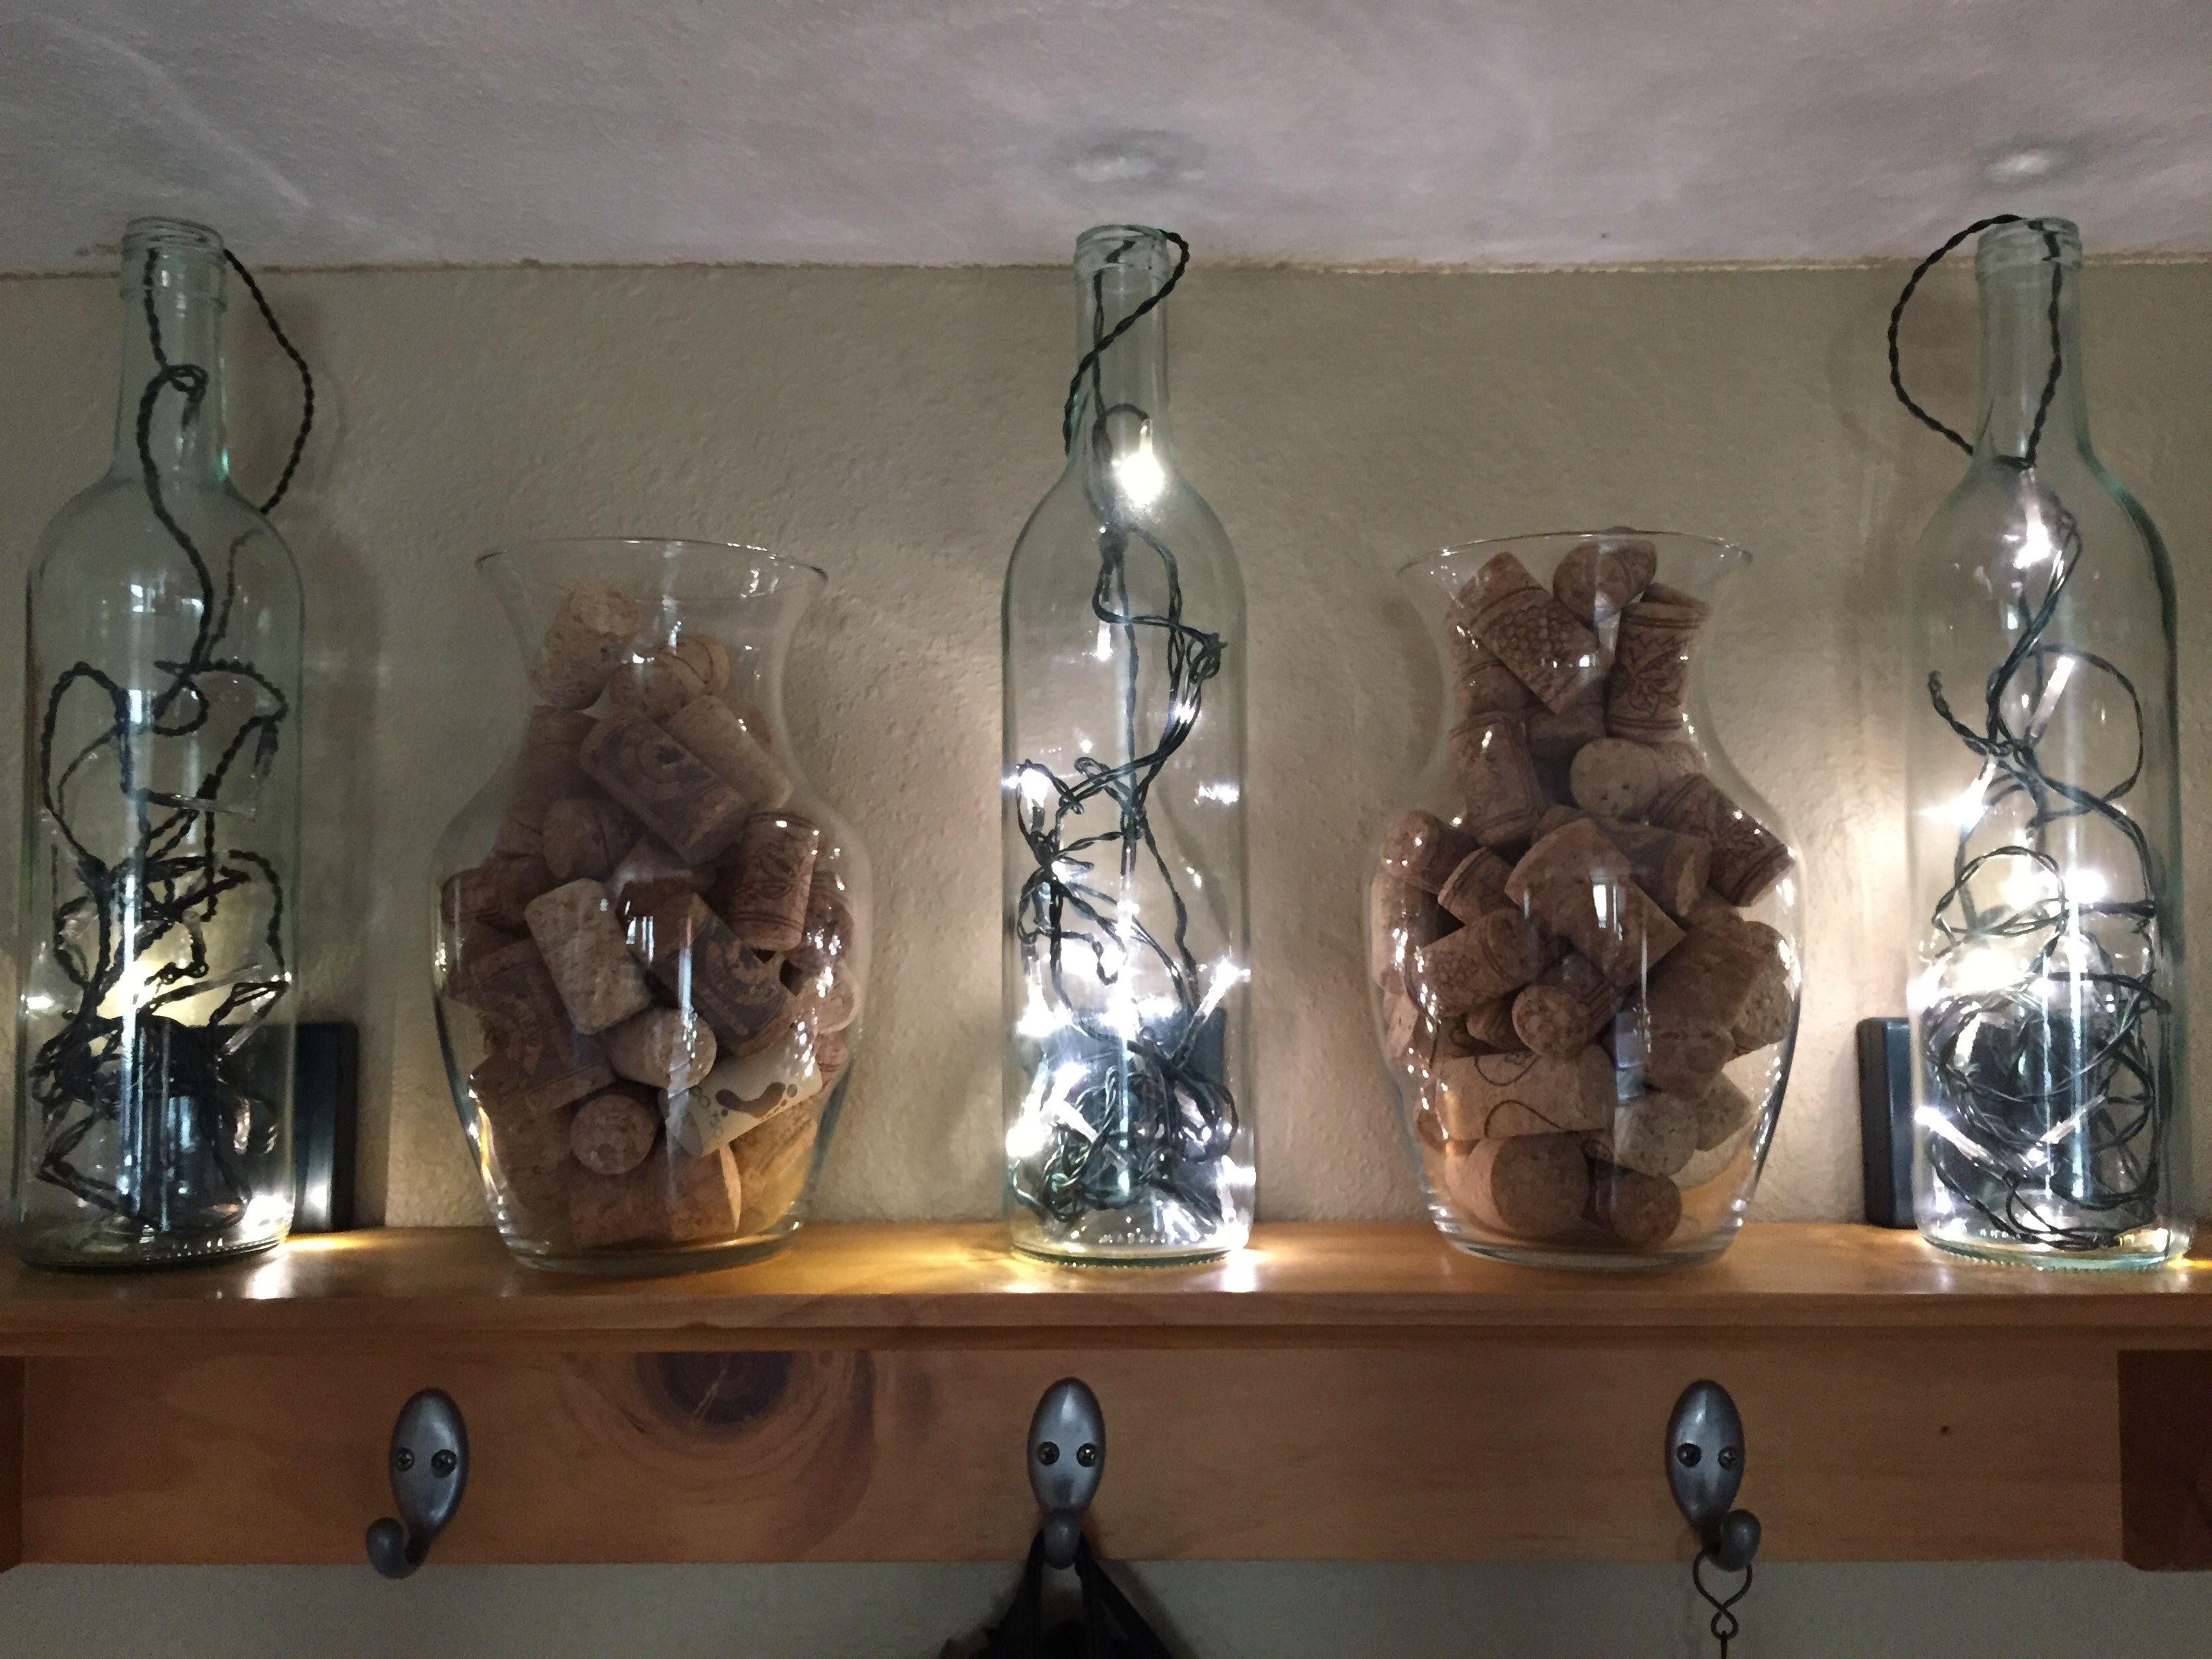 Lights in wine bottles and wine corks in vases places spaces lights in wine bottles and wine corks in vases reviewsmspy